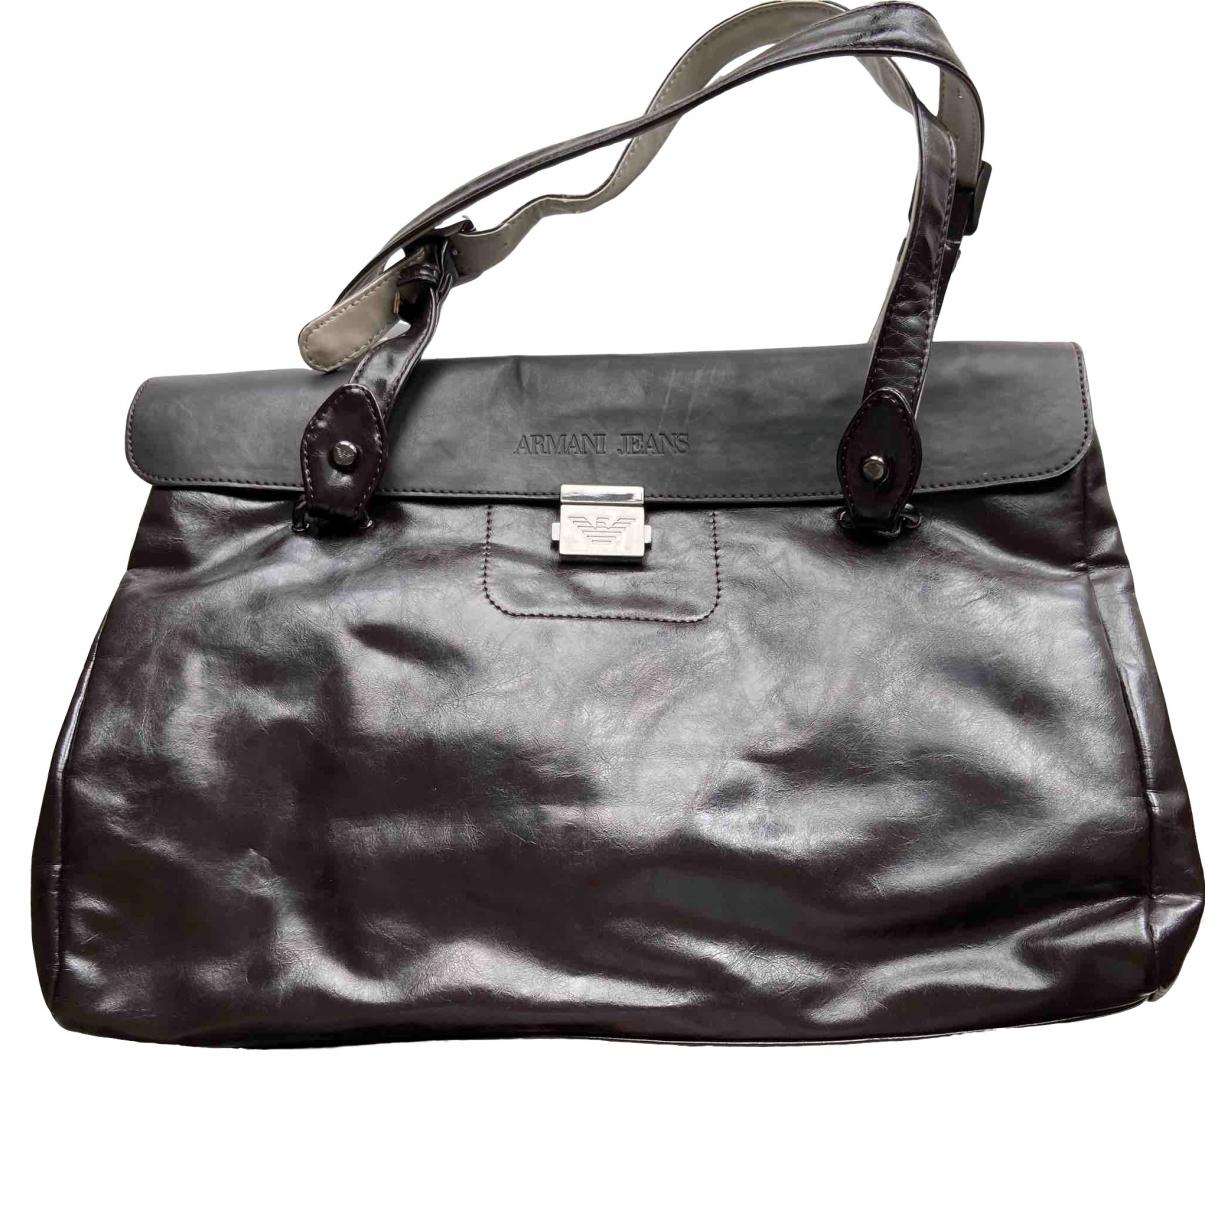 Armani Jeans \N Handtasche in  Braun Synthetik